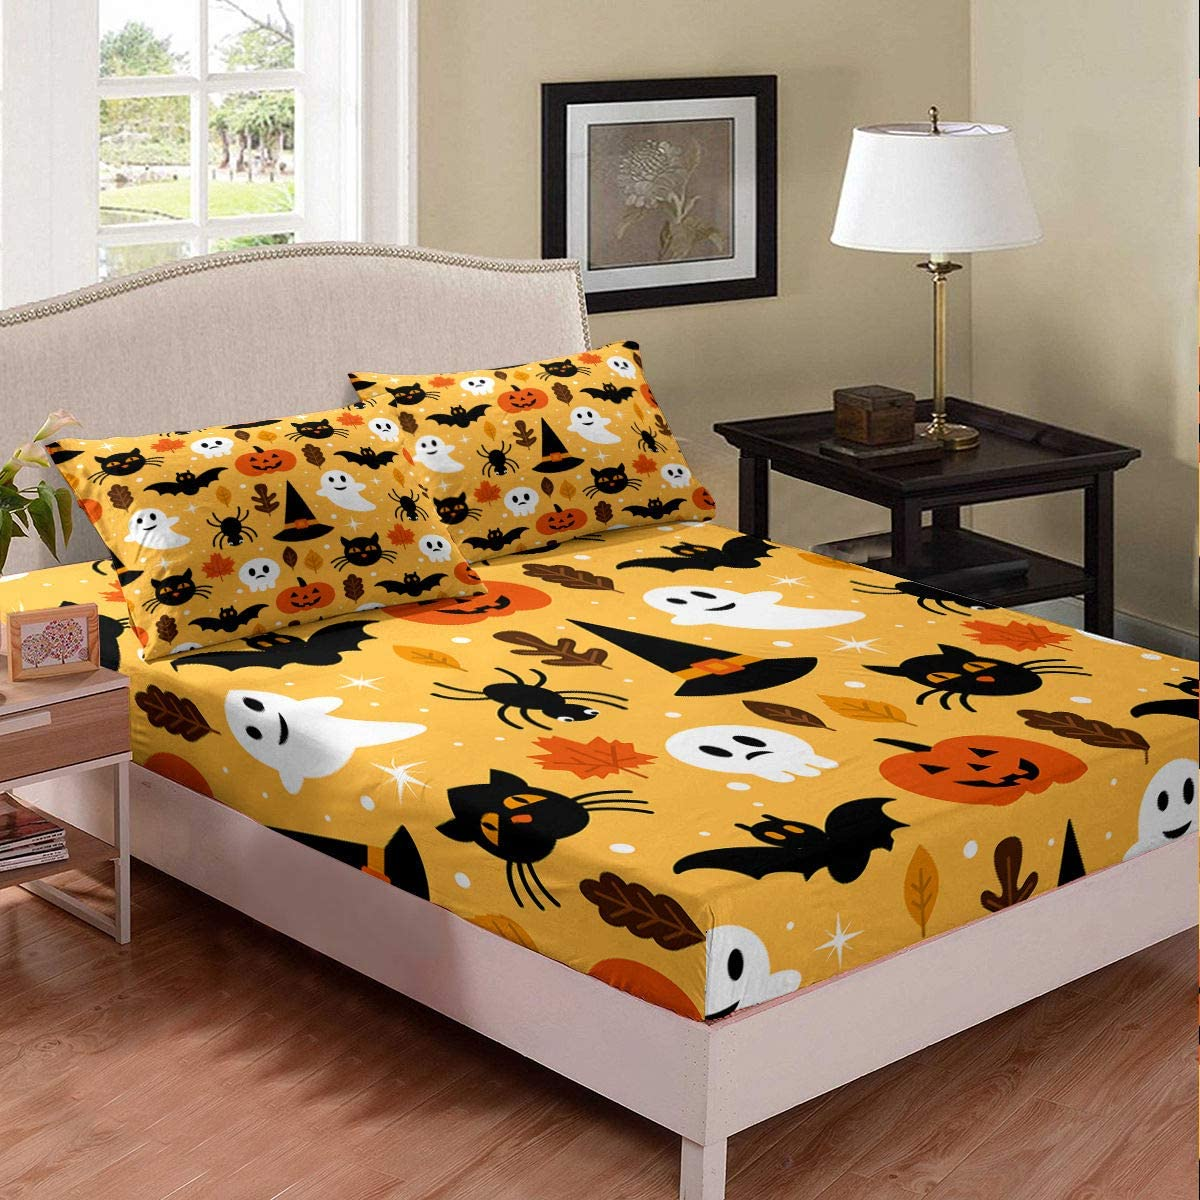 Erosebridal Halloween Fitted Sheet TwinXL Cartoon Pumpkin Sheet Set Lantern Bedding Ghost Bed Cover for Kids Boys Girls Bedroom Decor 2 Pcs Bedding Set